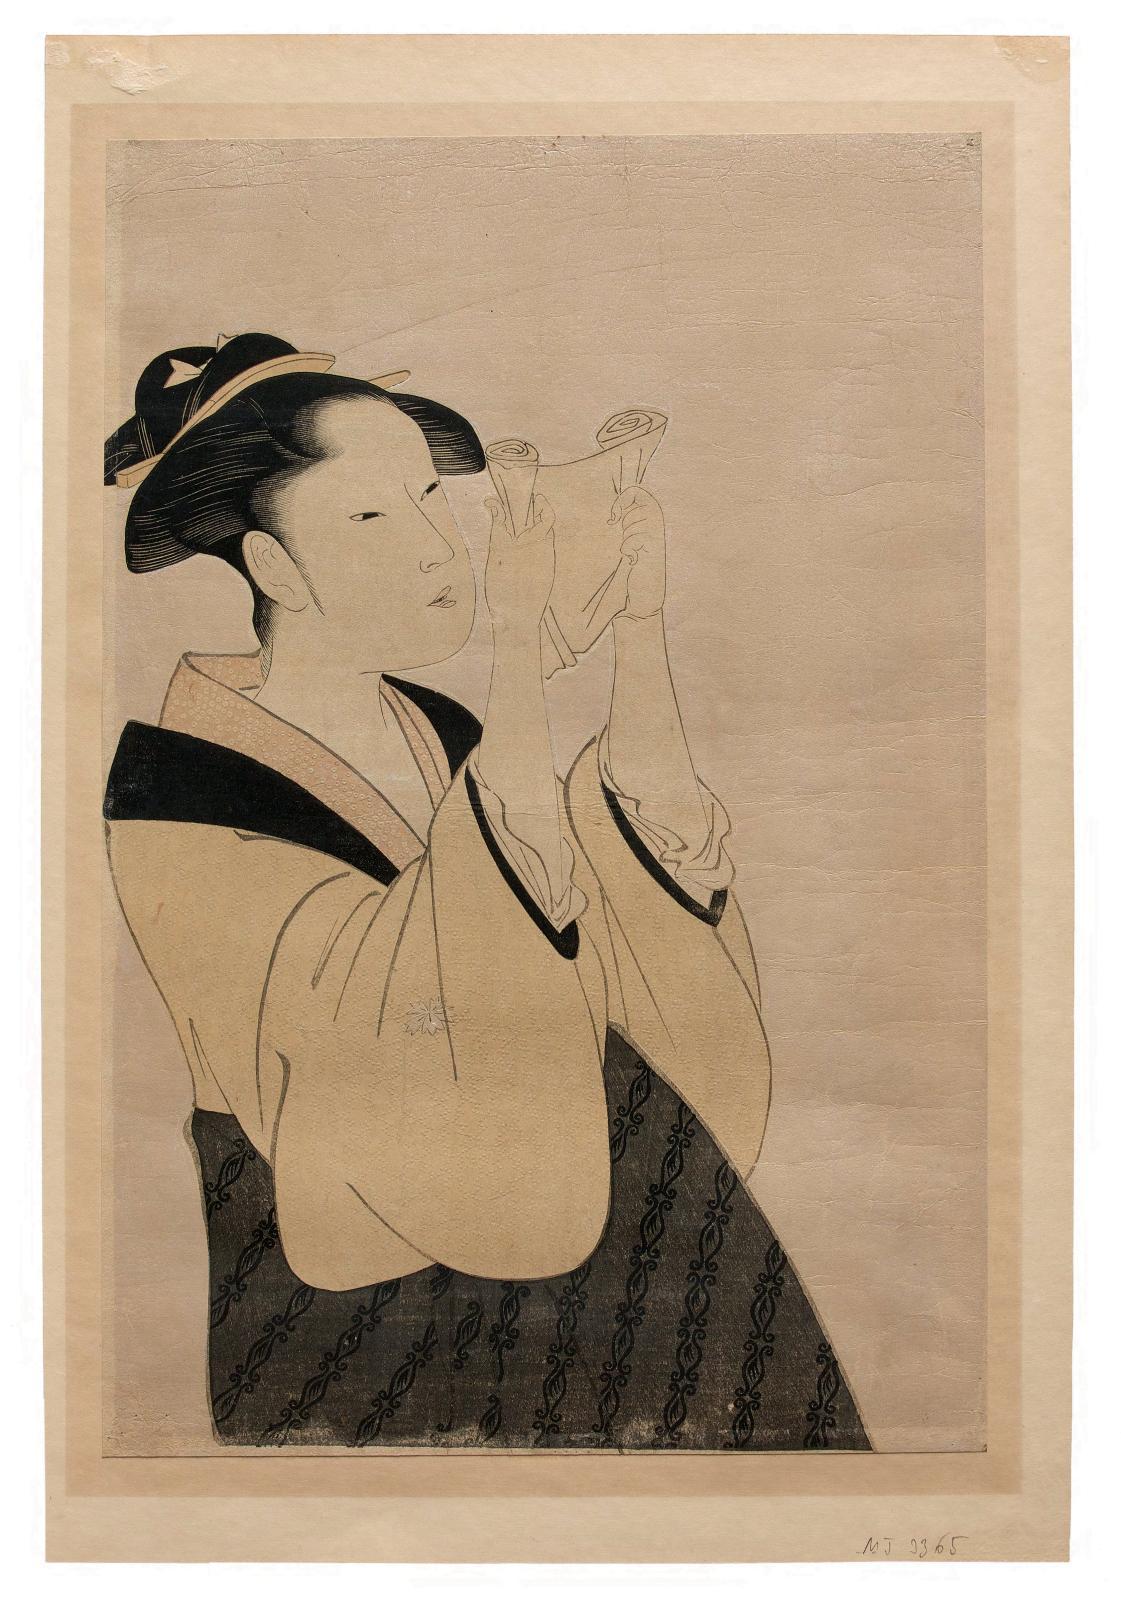 Kitagawa Utamaro (1753?-1806), Jeune Femme lisant une lettre (Fumi yomu onna), de la série «Dix types des physionomies de femmes» (Fujo ninso juppon)